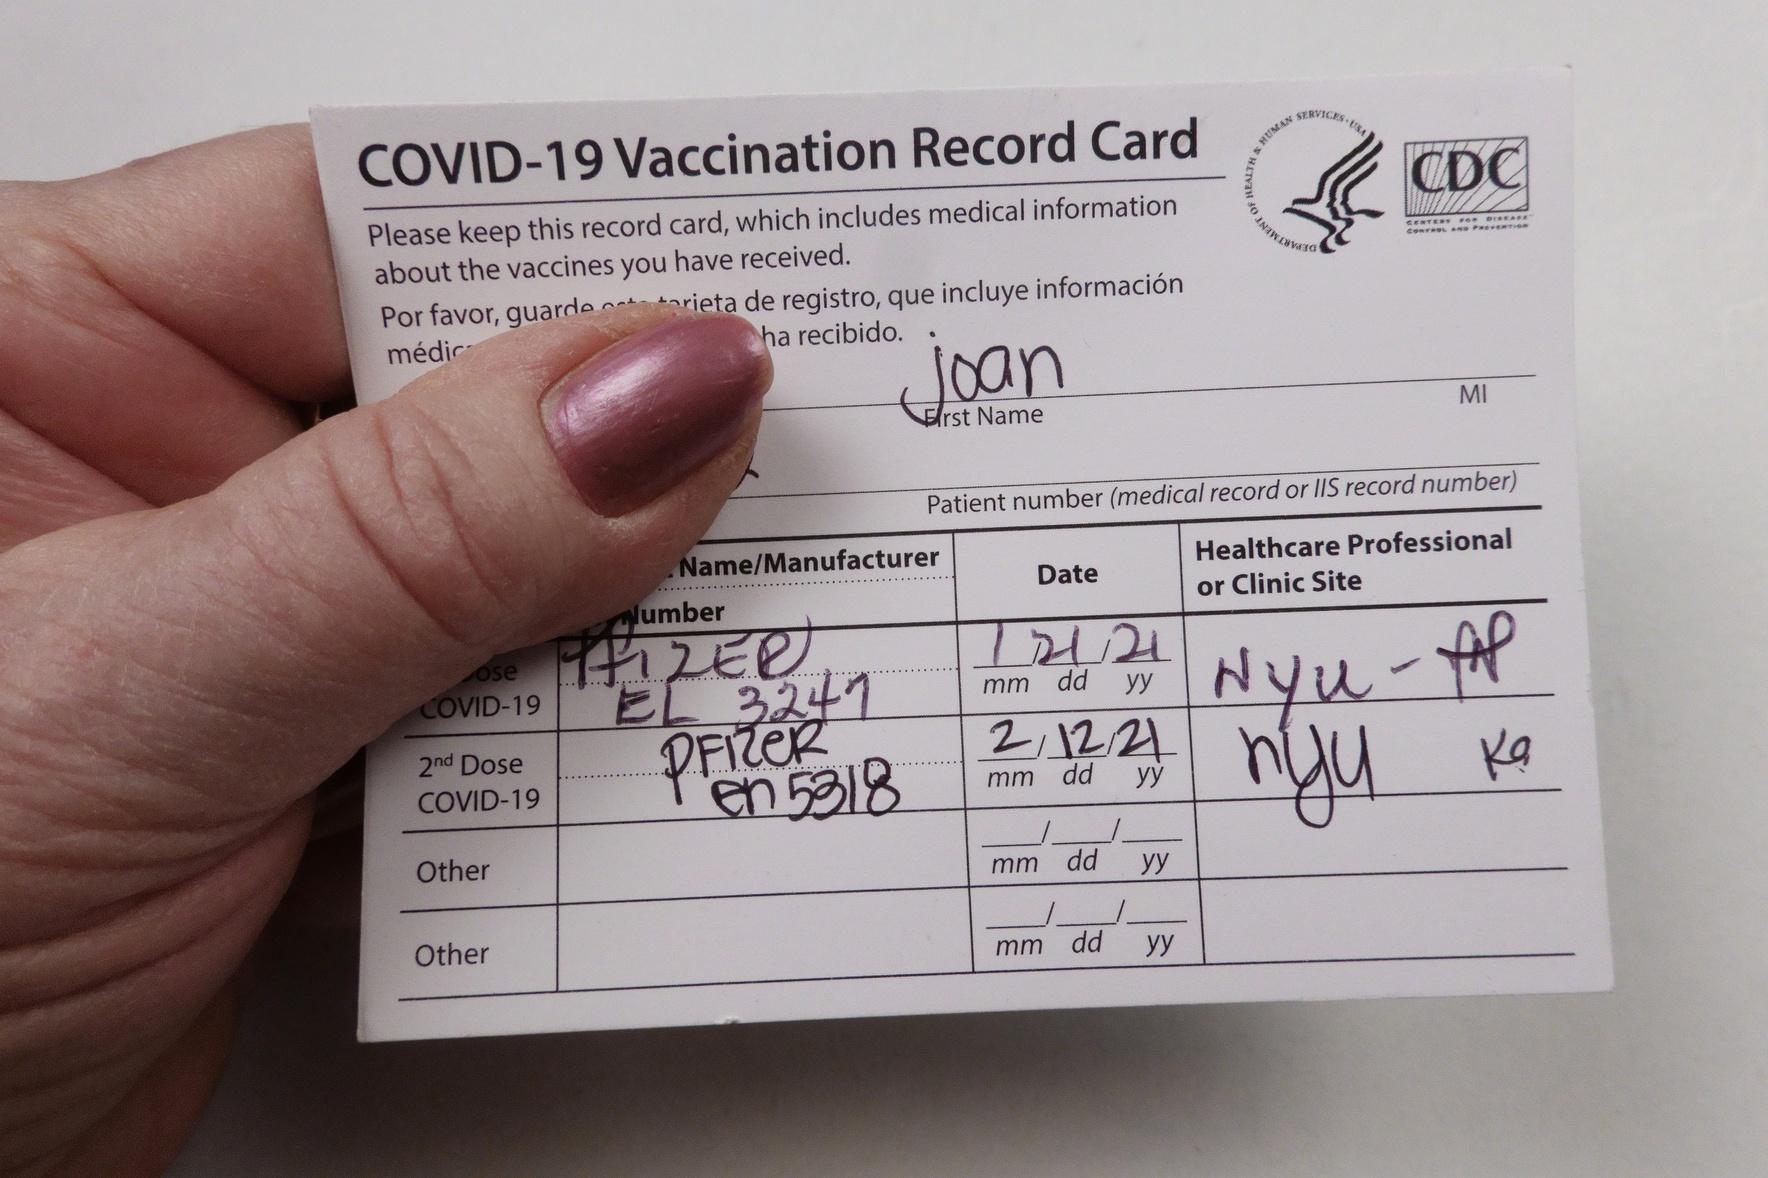 Covid 19 vaccinated record card